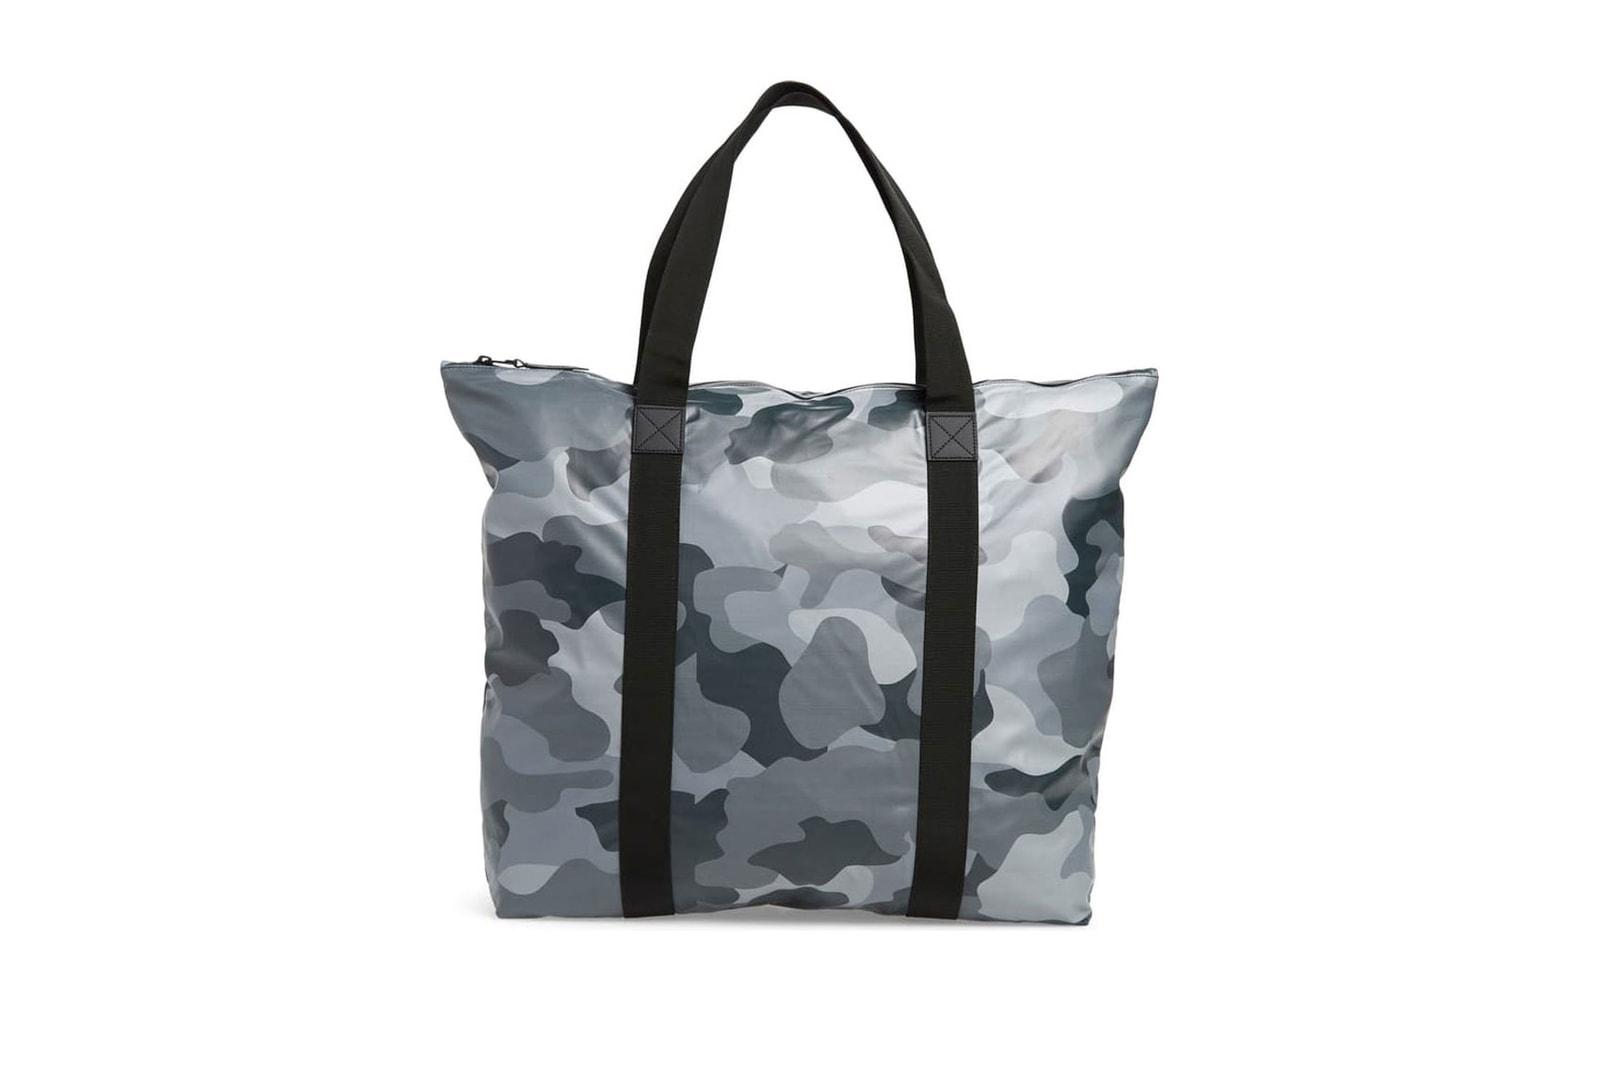 beach bag summer essentials affordable cheap sunglasses dress bucket hat tote bag towel water bottle bluetooth speaker